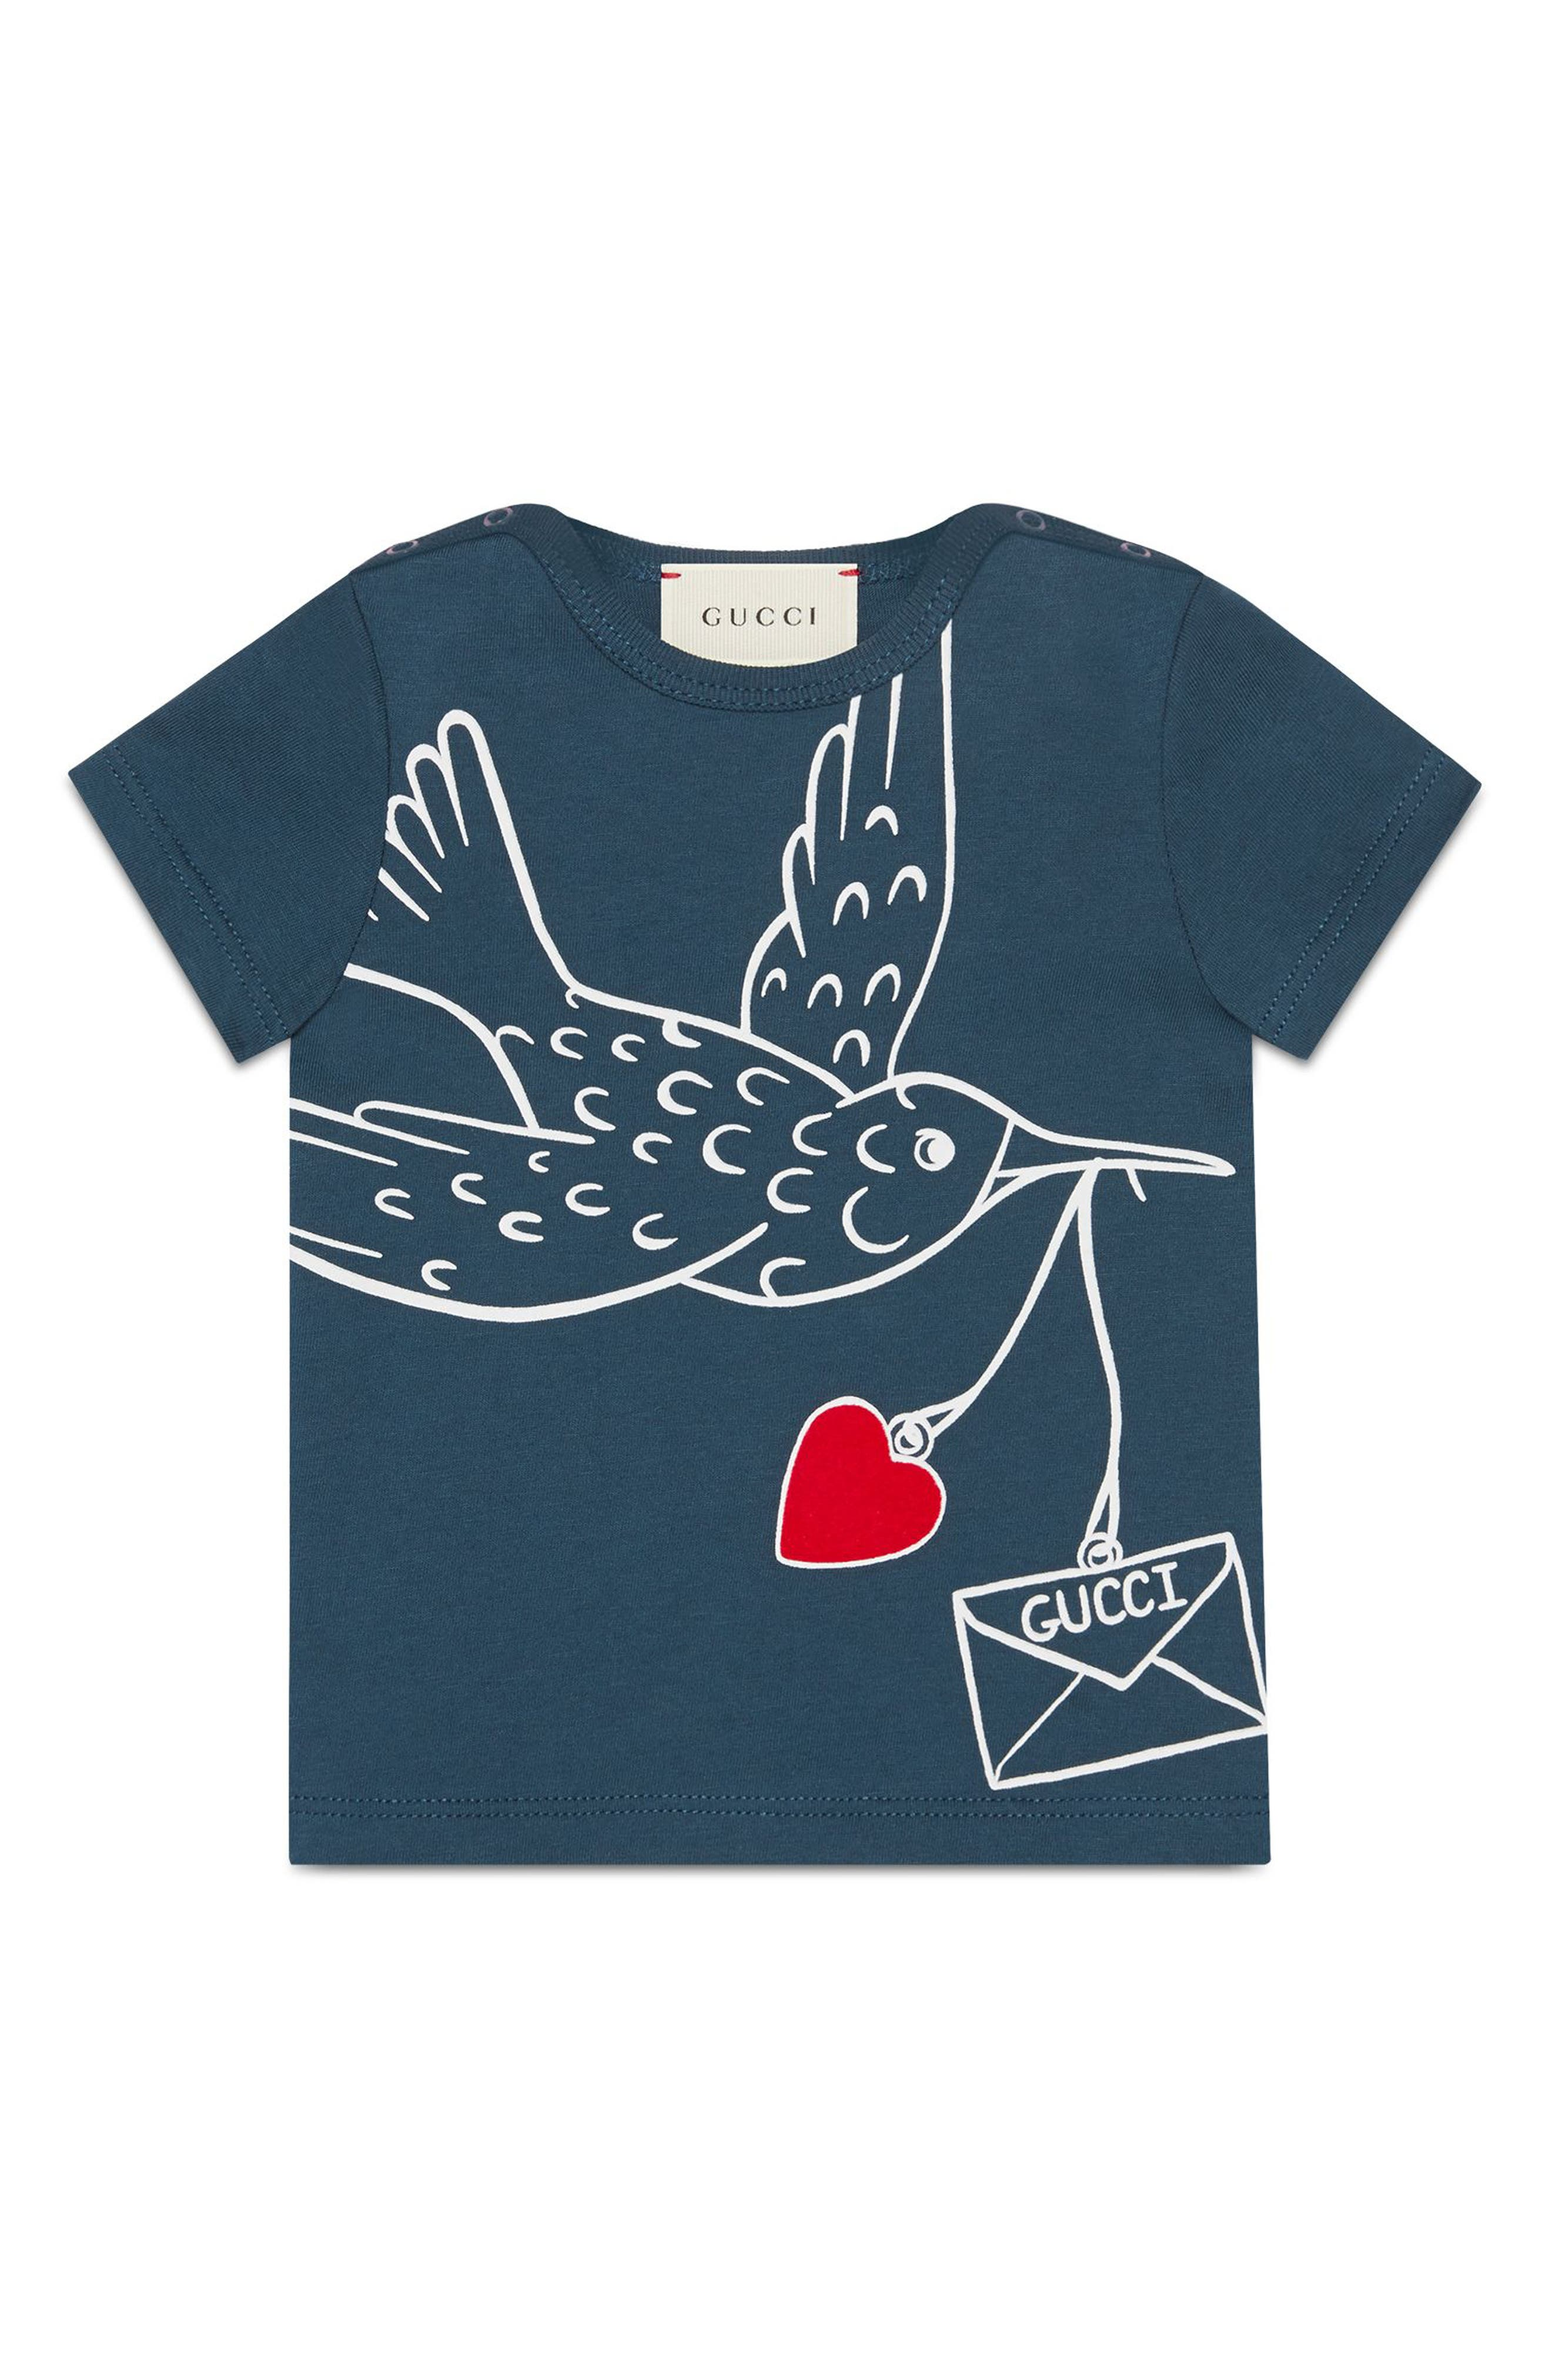 Gucci Bird Graphic Tee (Baby)